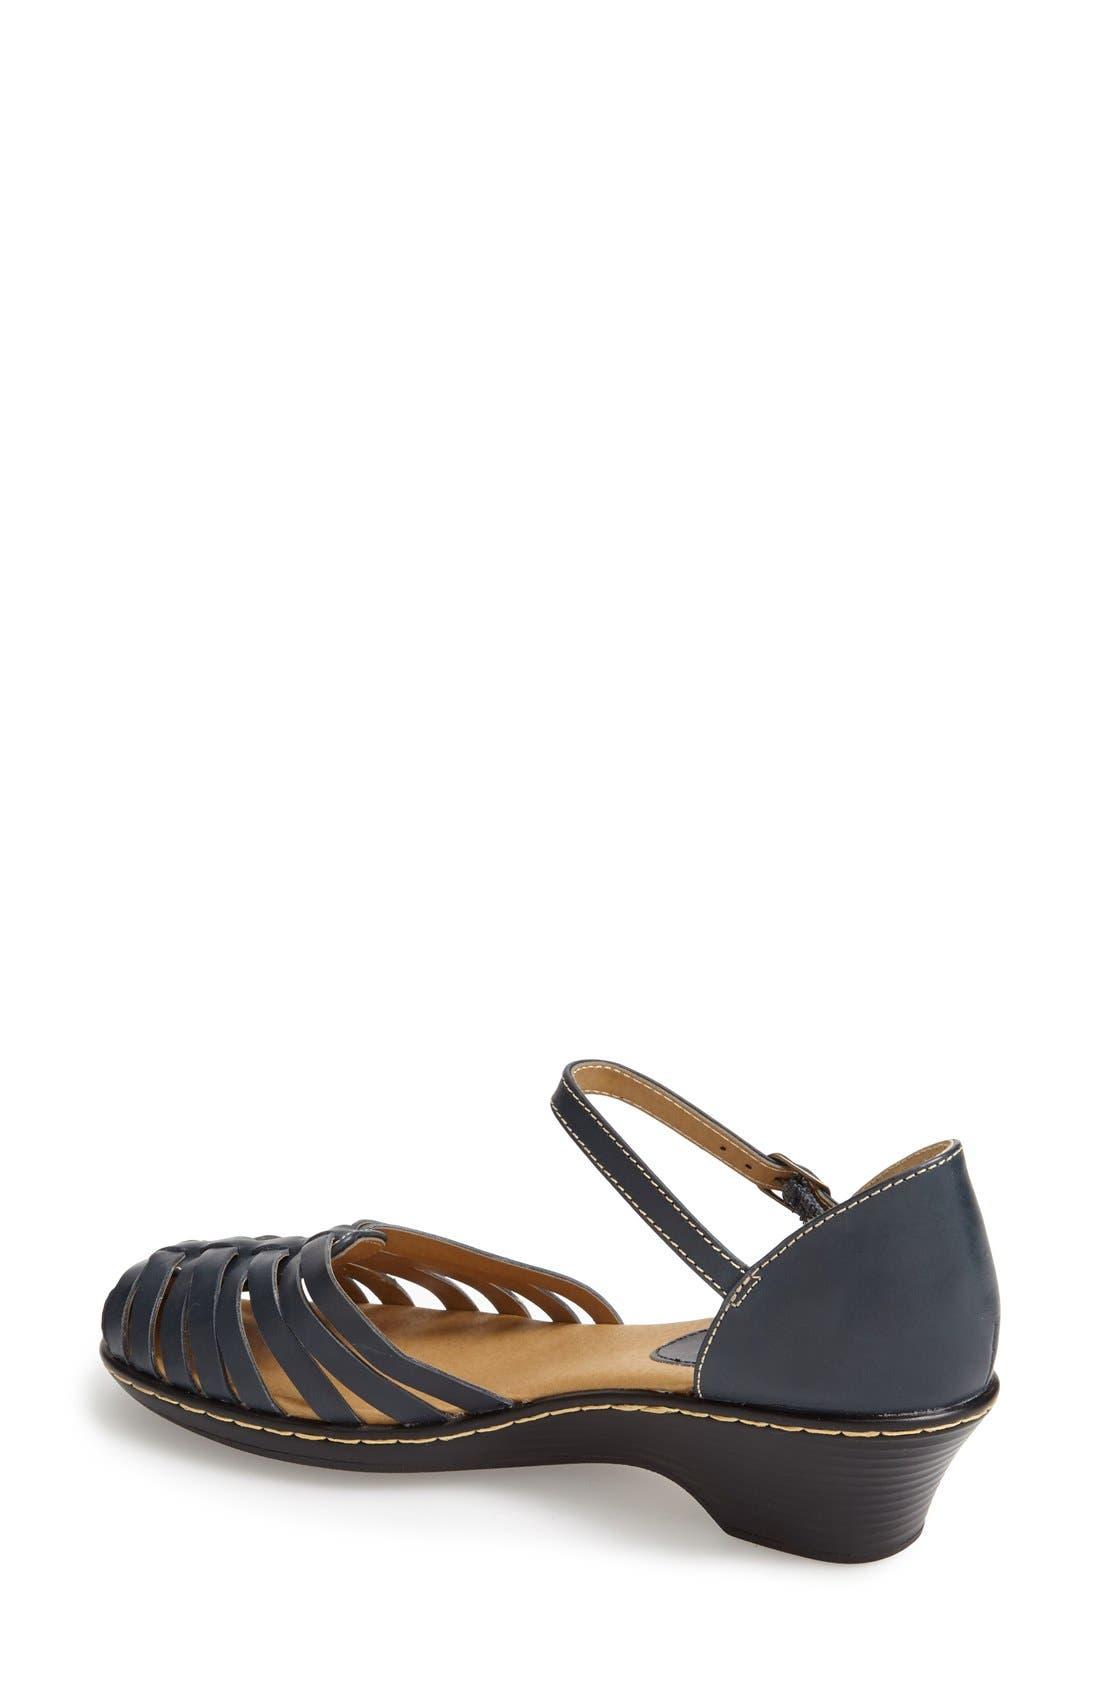 Alternate Image 2  - Softspots 'Tatianna' Sandal